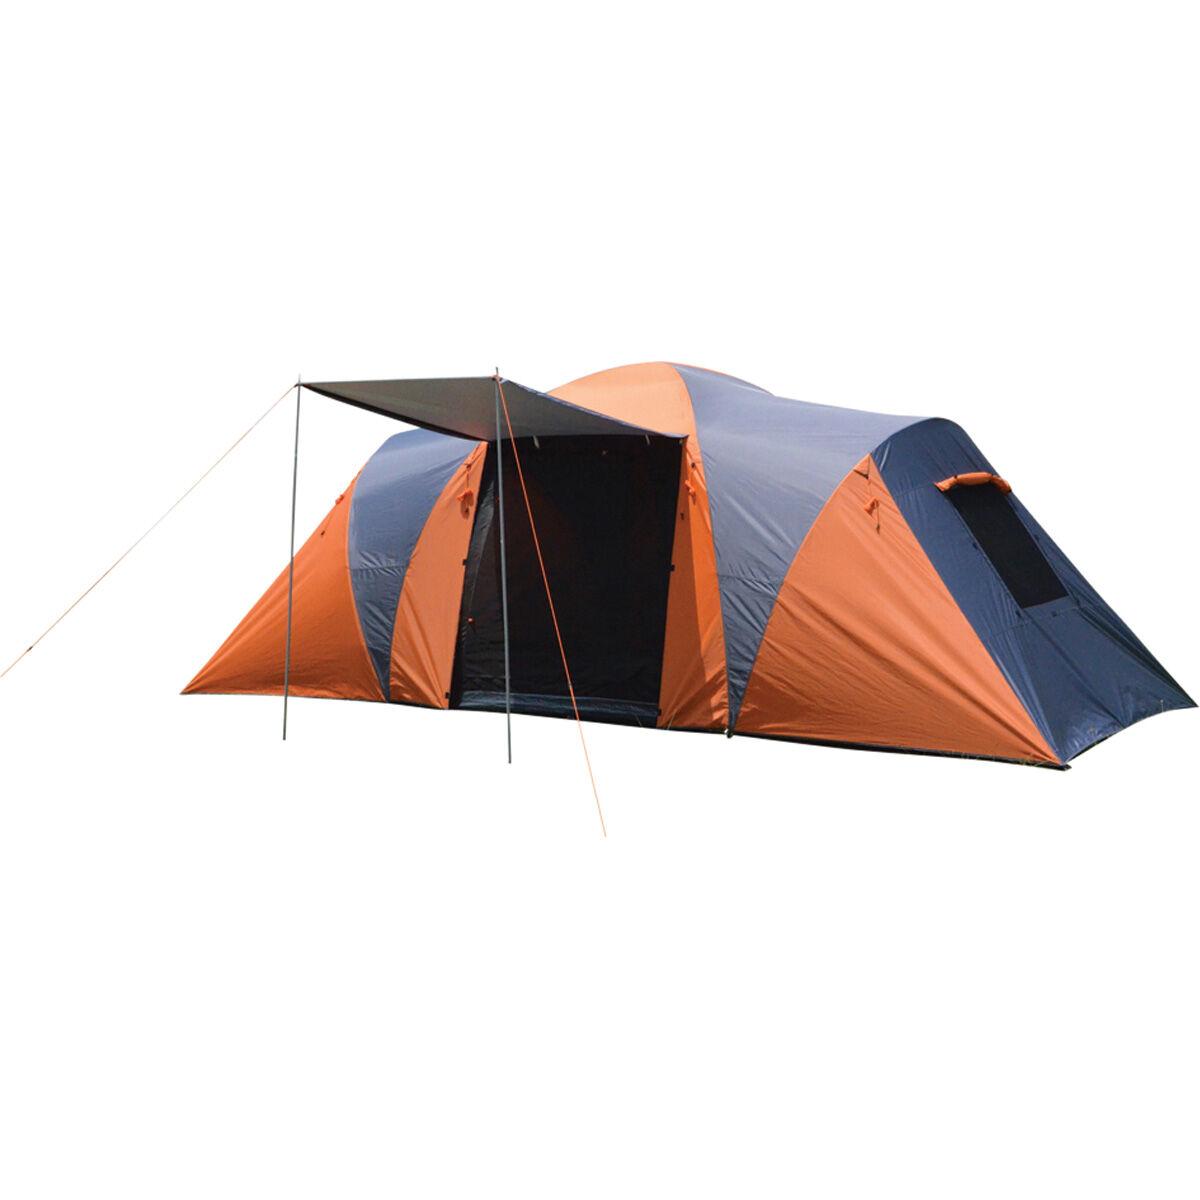 Wanderer Larapinta Dome Tent 10 Person  bcf_hi-res ...  sc 1 st  BCF Australia & Dome Tents - Buy Online - BCF Australia